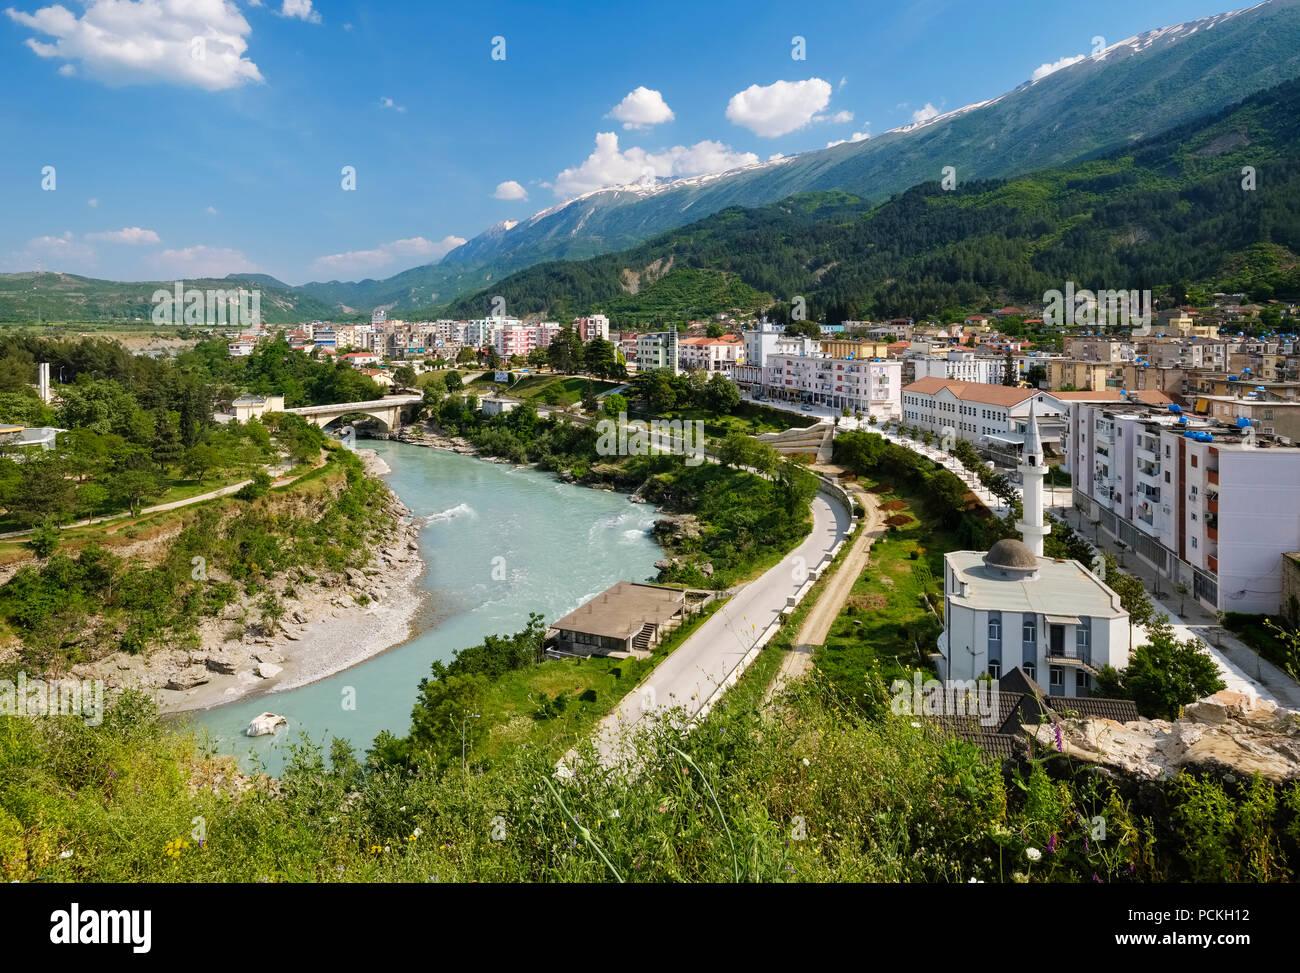 Lumi seman albanien dating